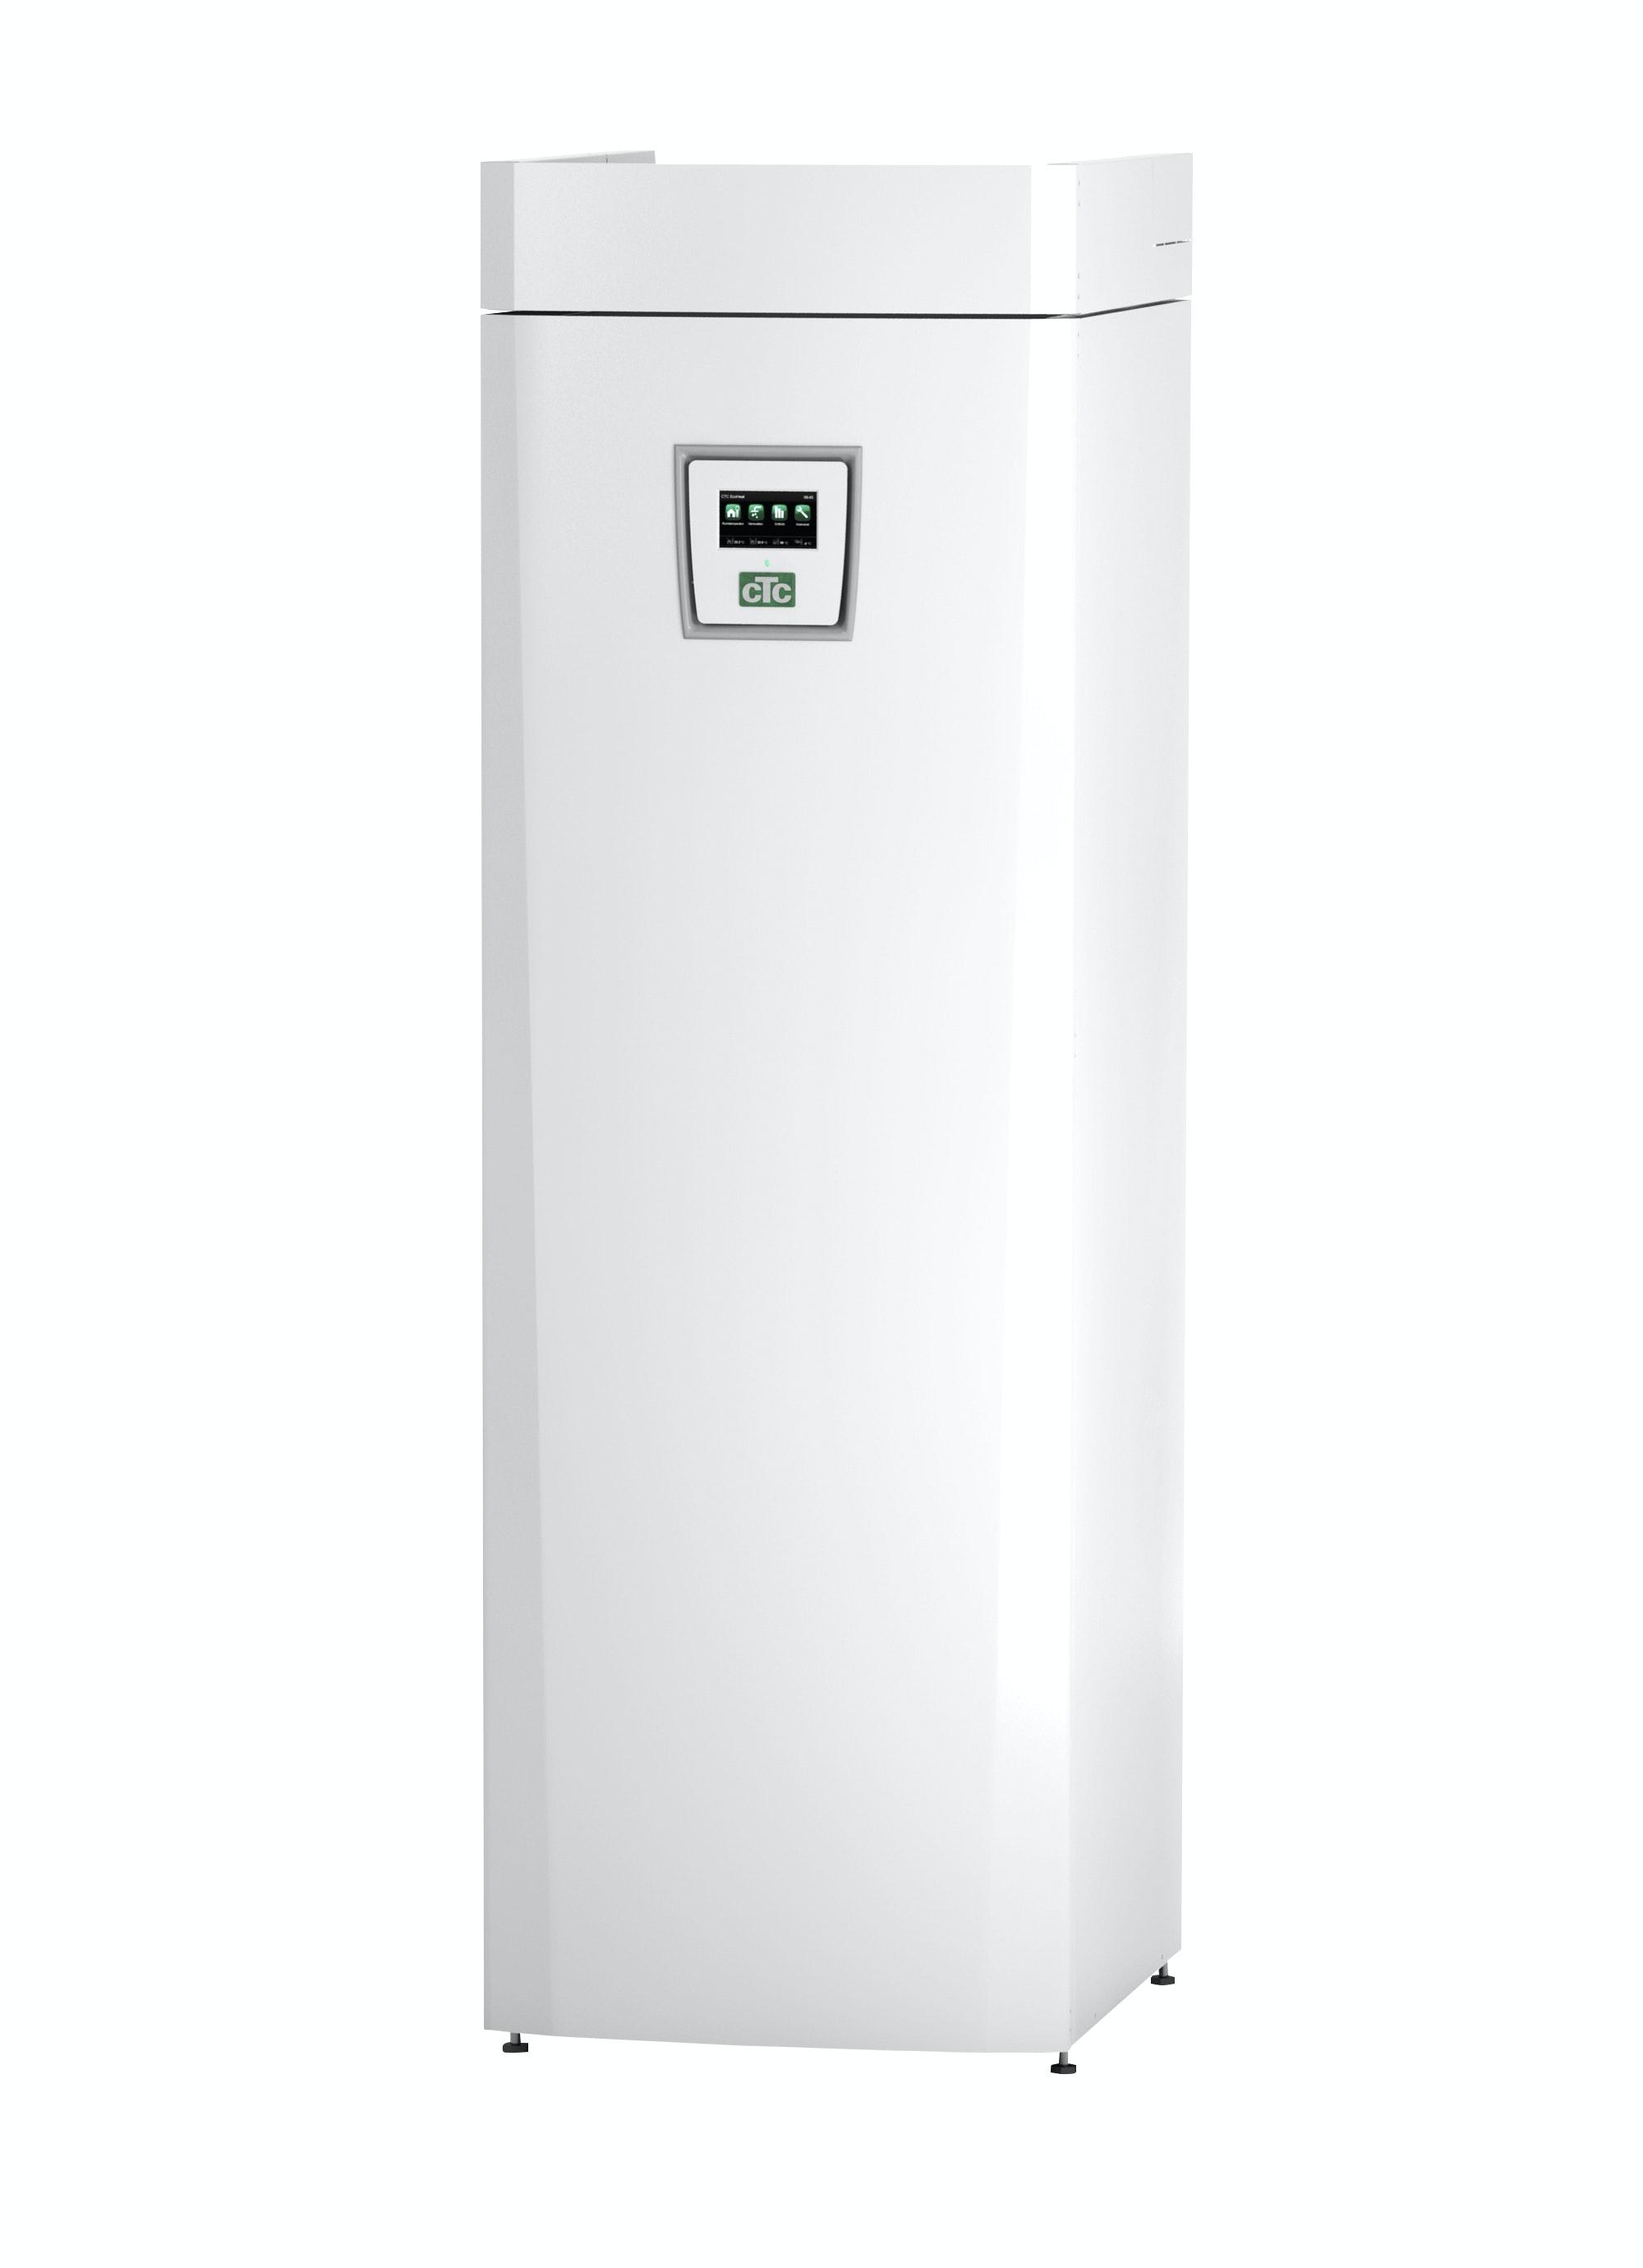 Elpanna CTC Ecozenith i250L 1654mm